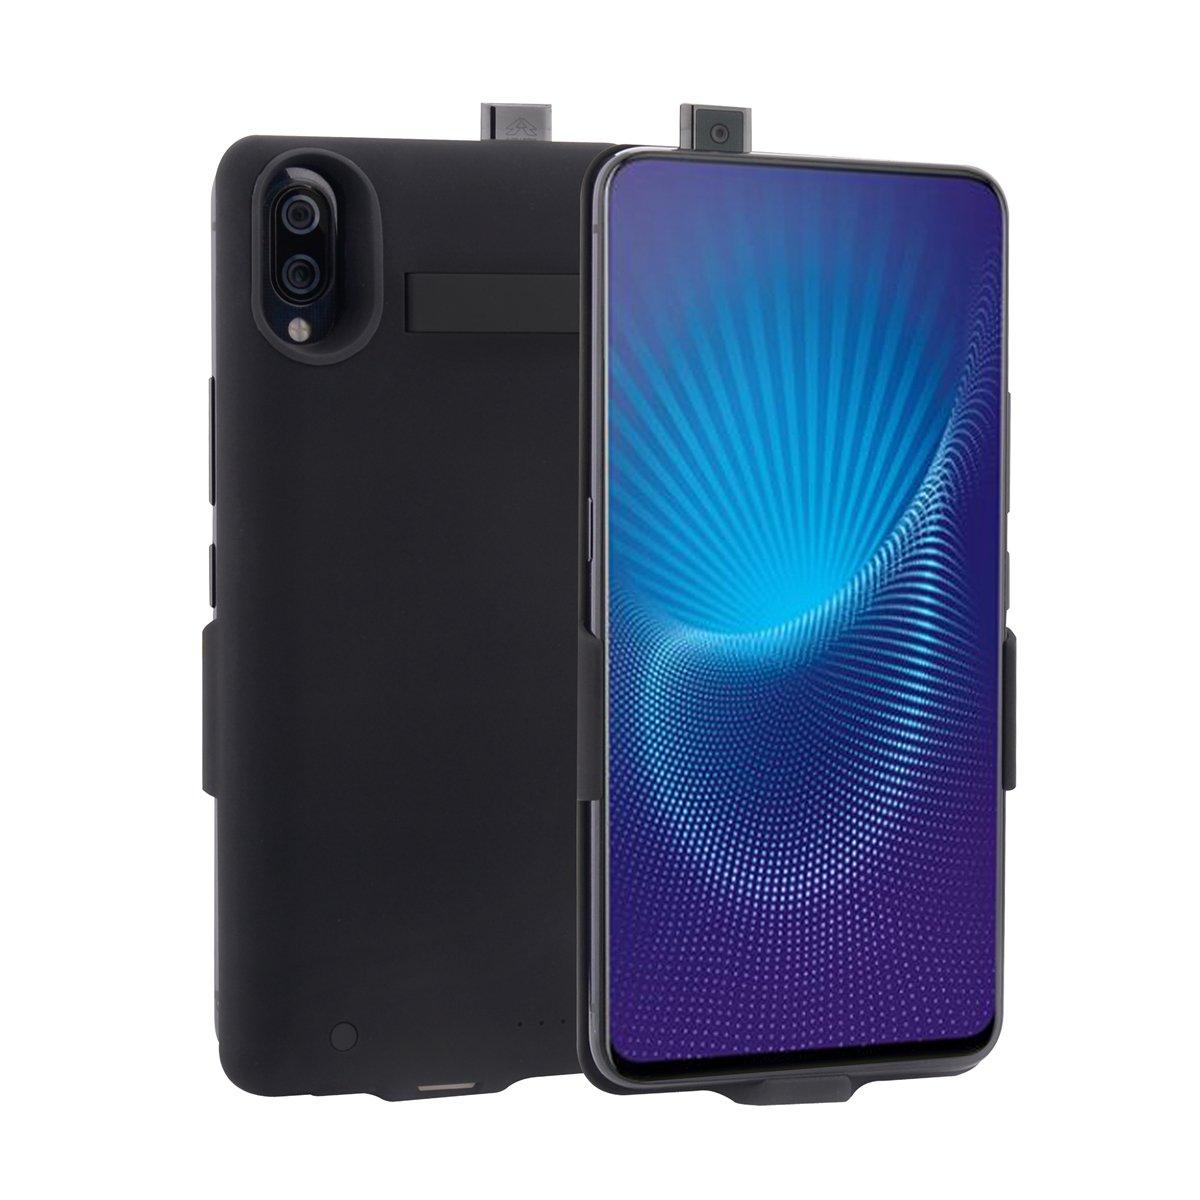 Compatible Vivo NEX Battery Charger Case - Portable Battery Case Slim Extended Battery Juice Power Bank for Vivo NEX (Black)